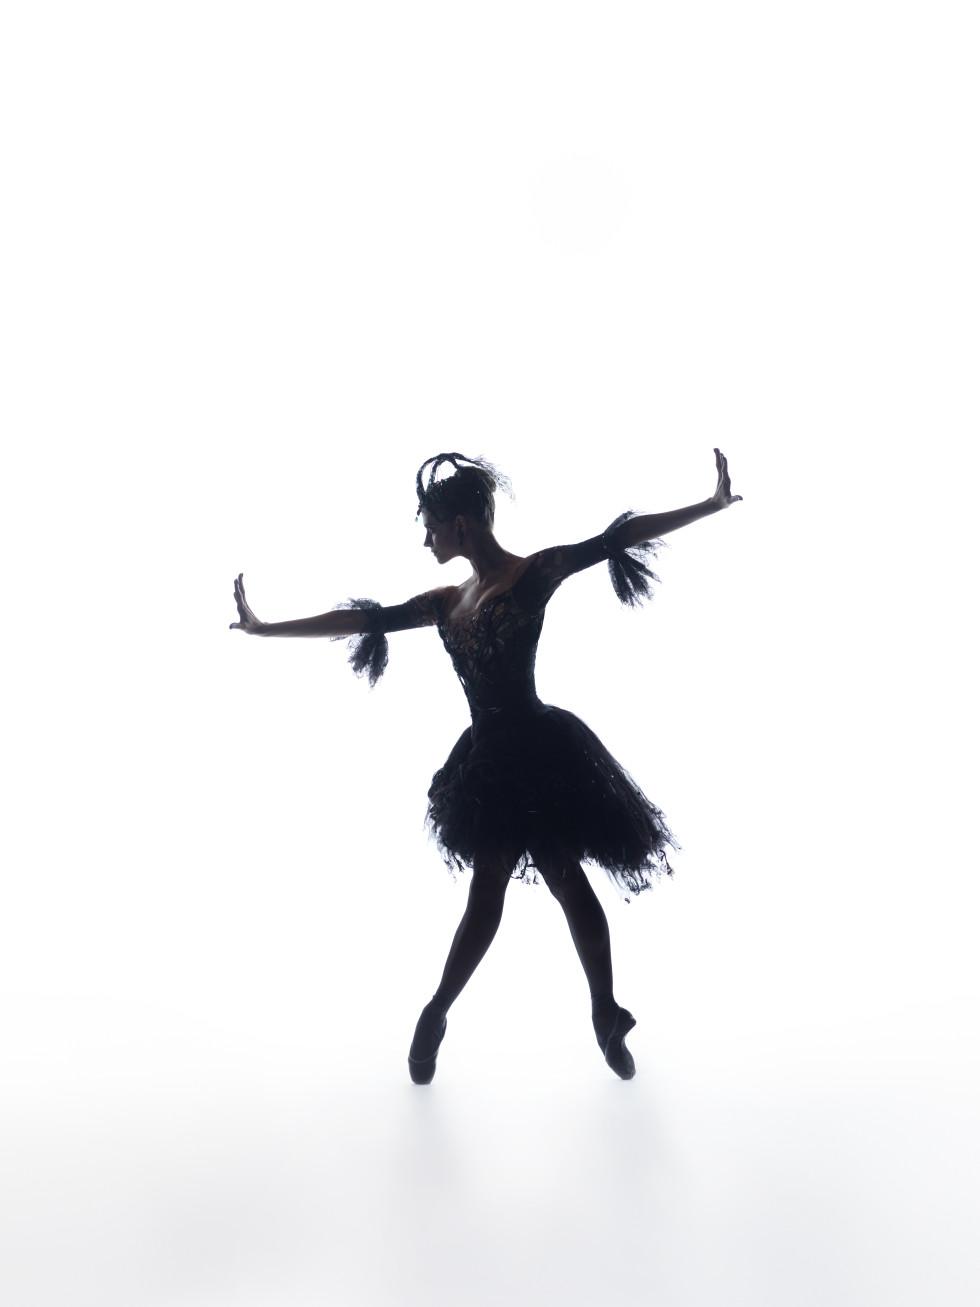 Houston Ballet soloist Jacquelyn Long as Carabosse